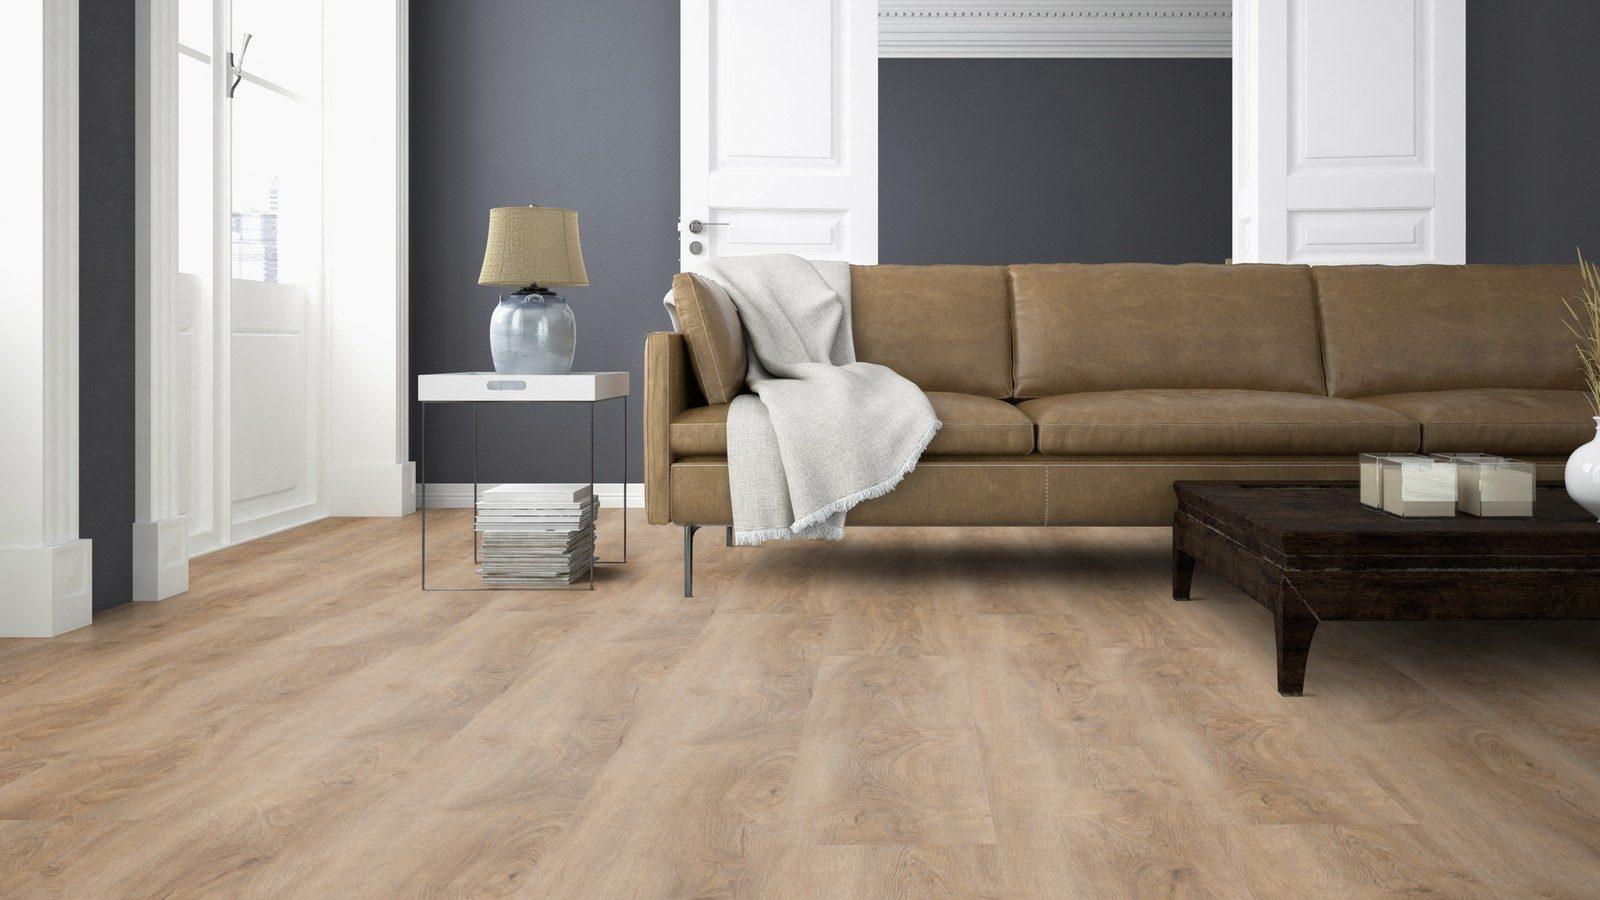 LVF700 Luxury Vinyl Plank Oak Malaga Beige Brown Wood4Floors